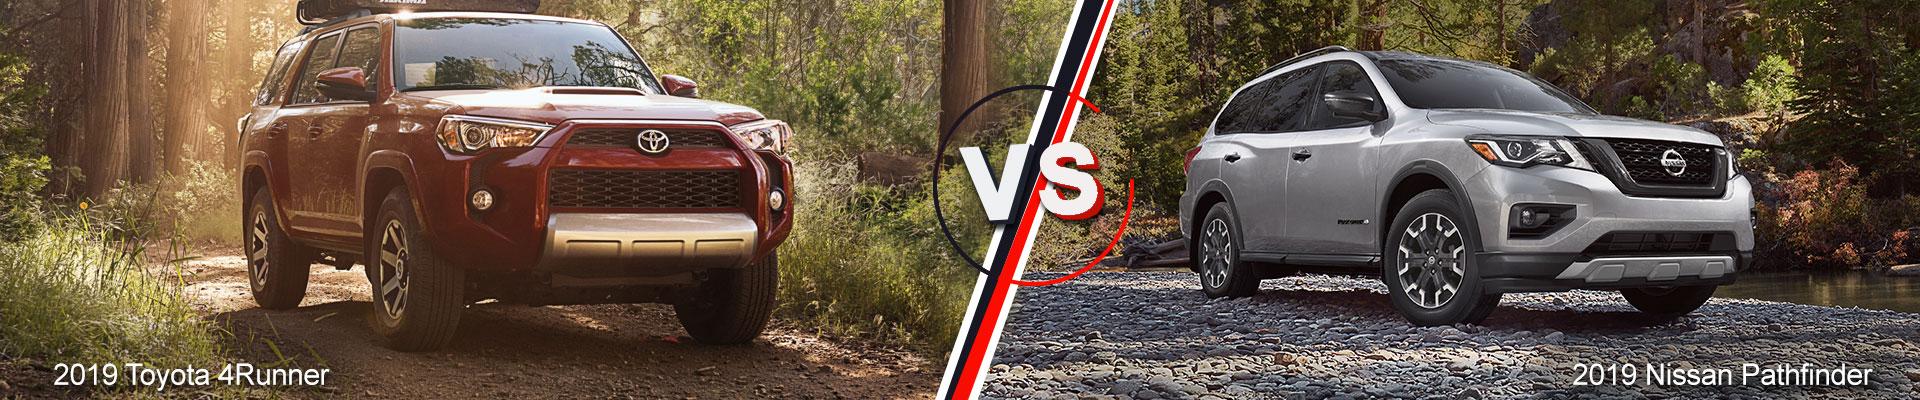 2019 Toyota 4Runner vs. 2019 Nissan Pathfinder in Everett, WA